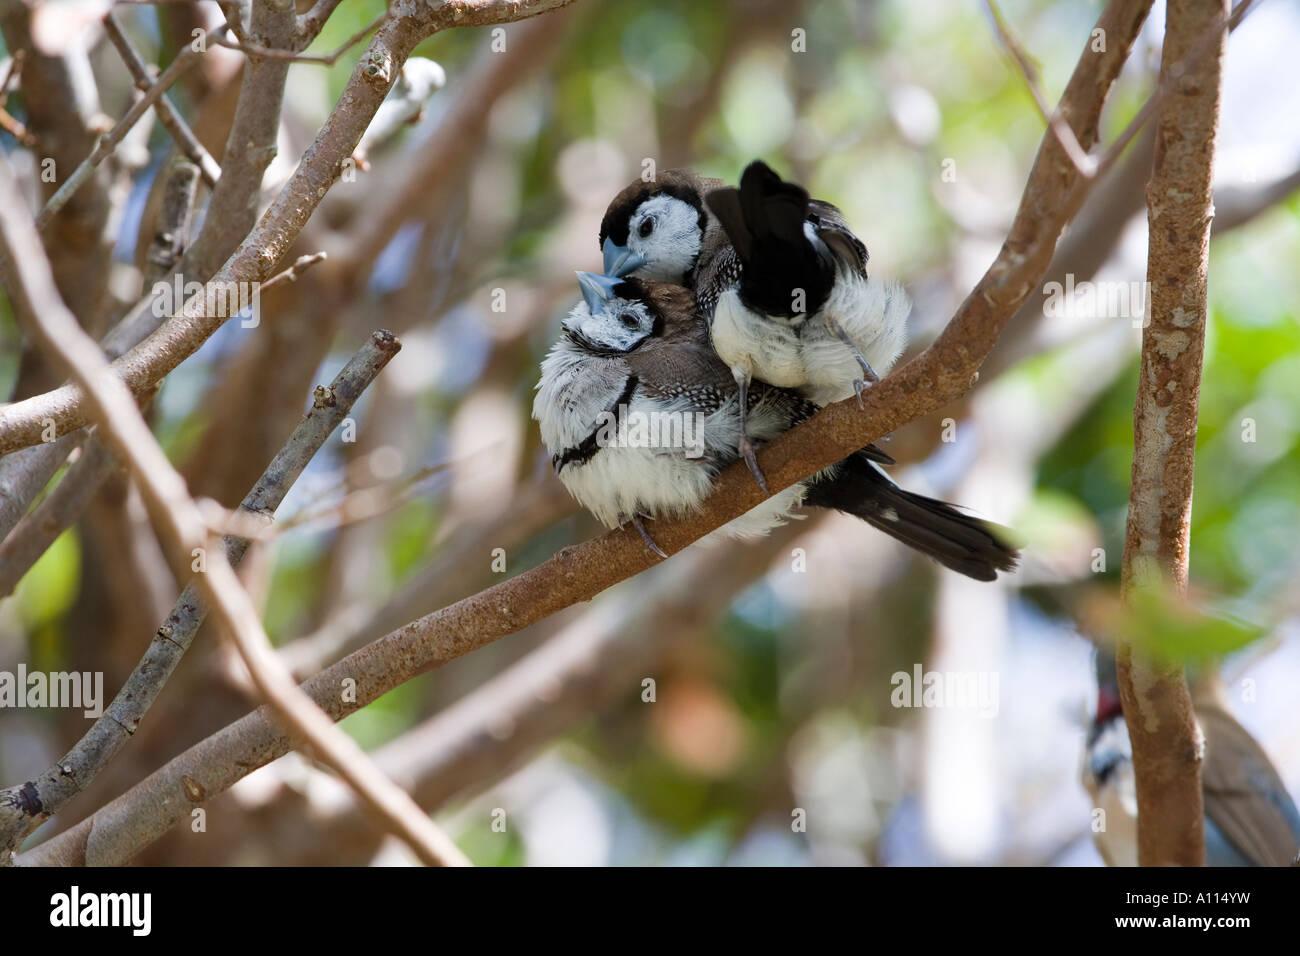 Owl Finch Taeniopygia Bichenovii Stock Photo Alamy